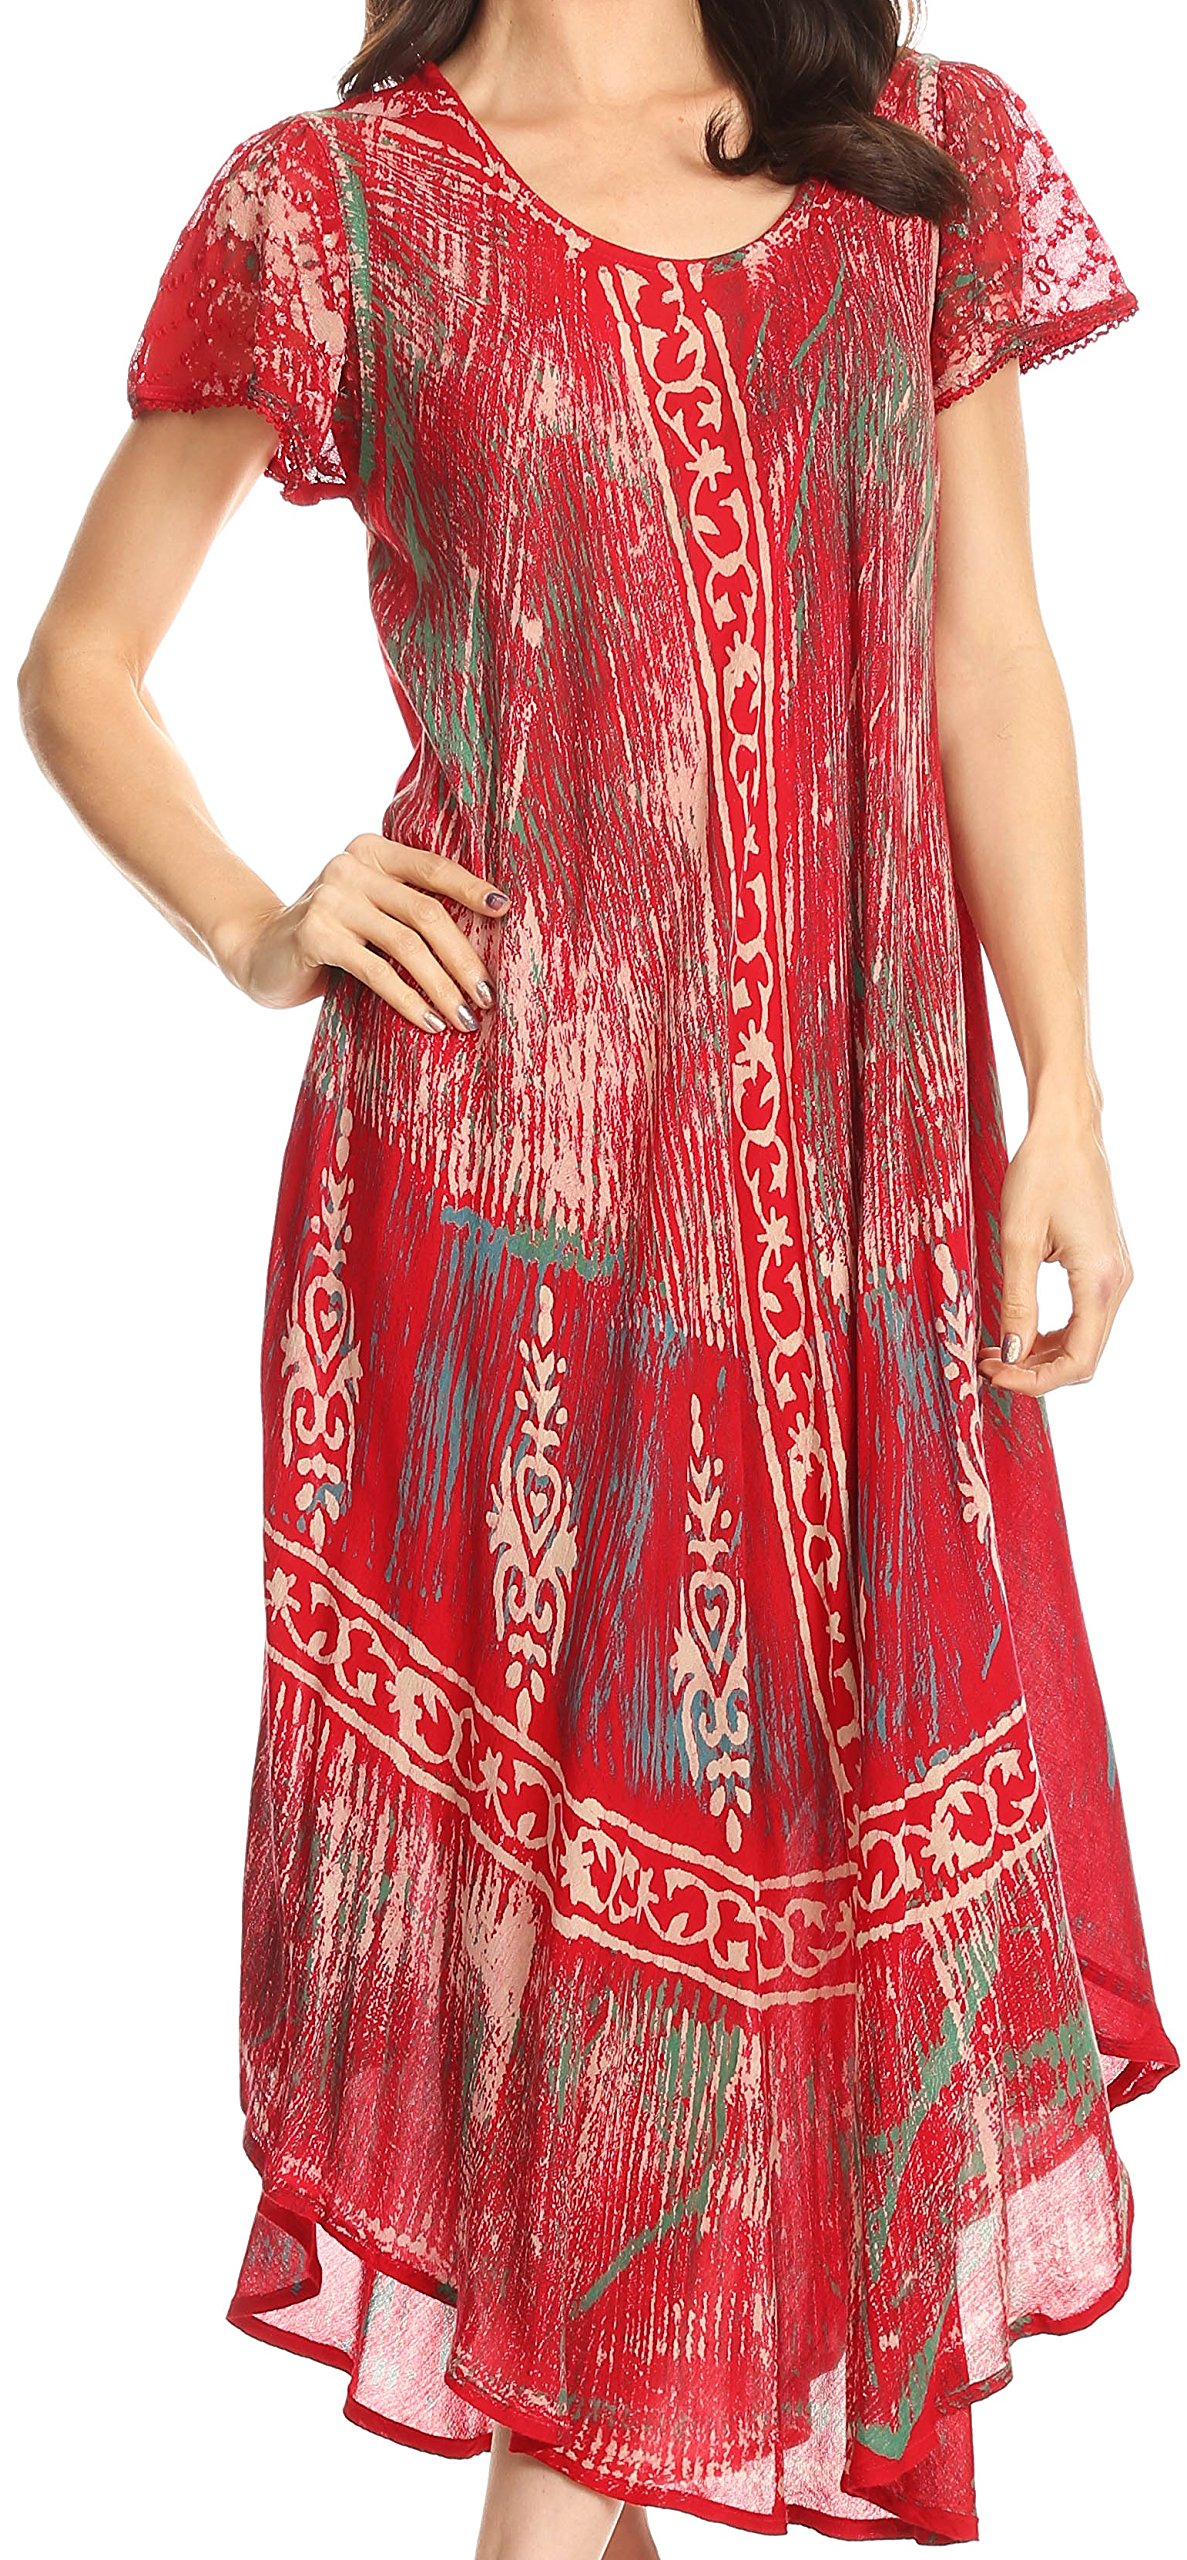 Sakkas 17811 - Talia Ethnic Print Short Sleeve Long Dress/Cover up - Red - OS